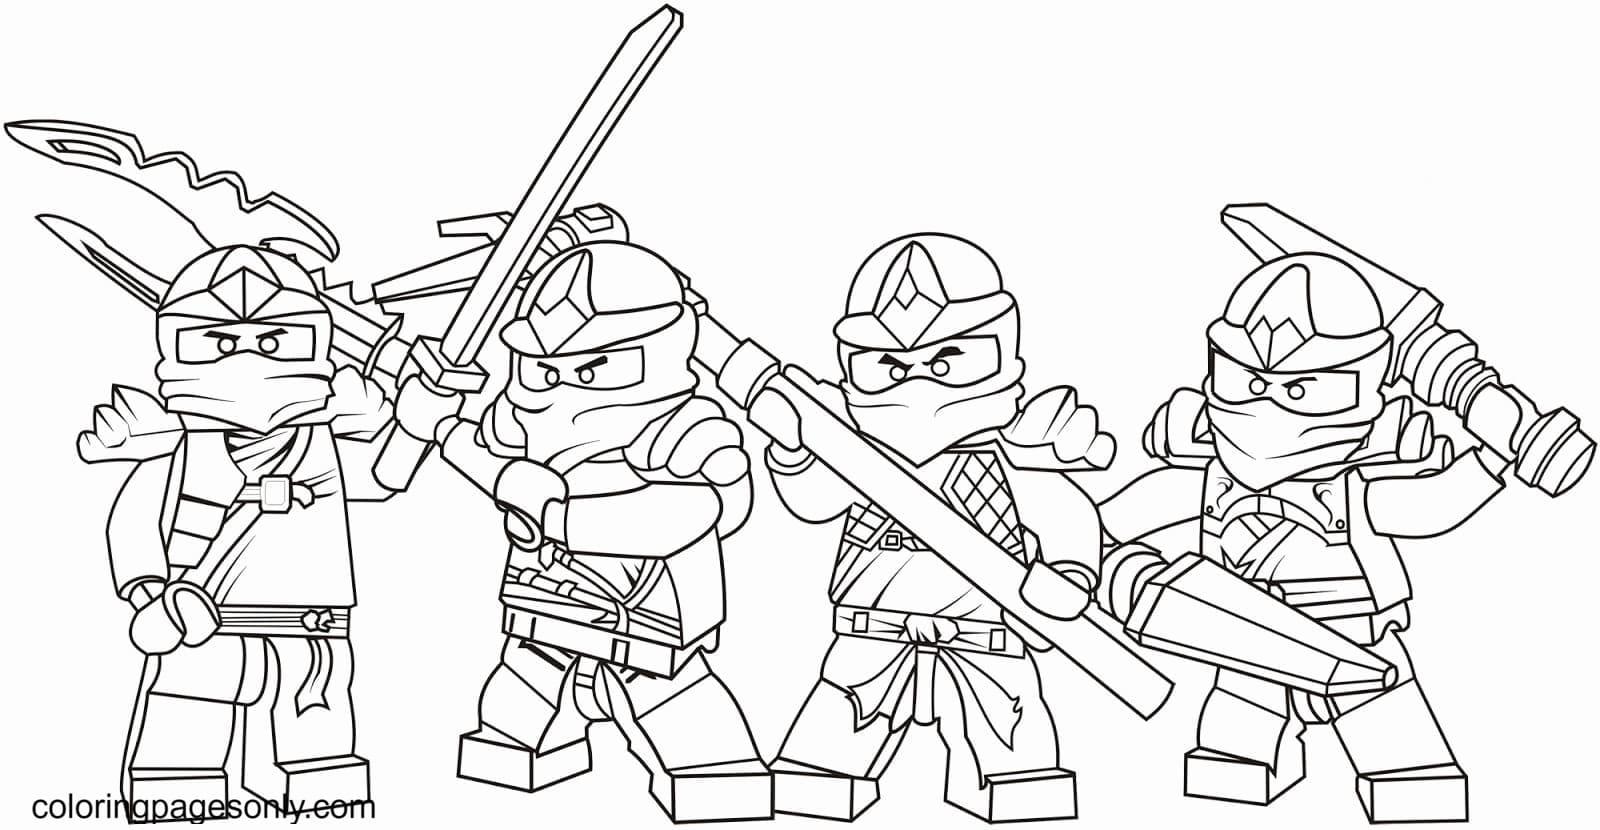 Lego Ninja fighting Coloring Page